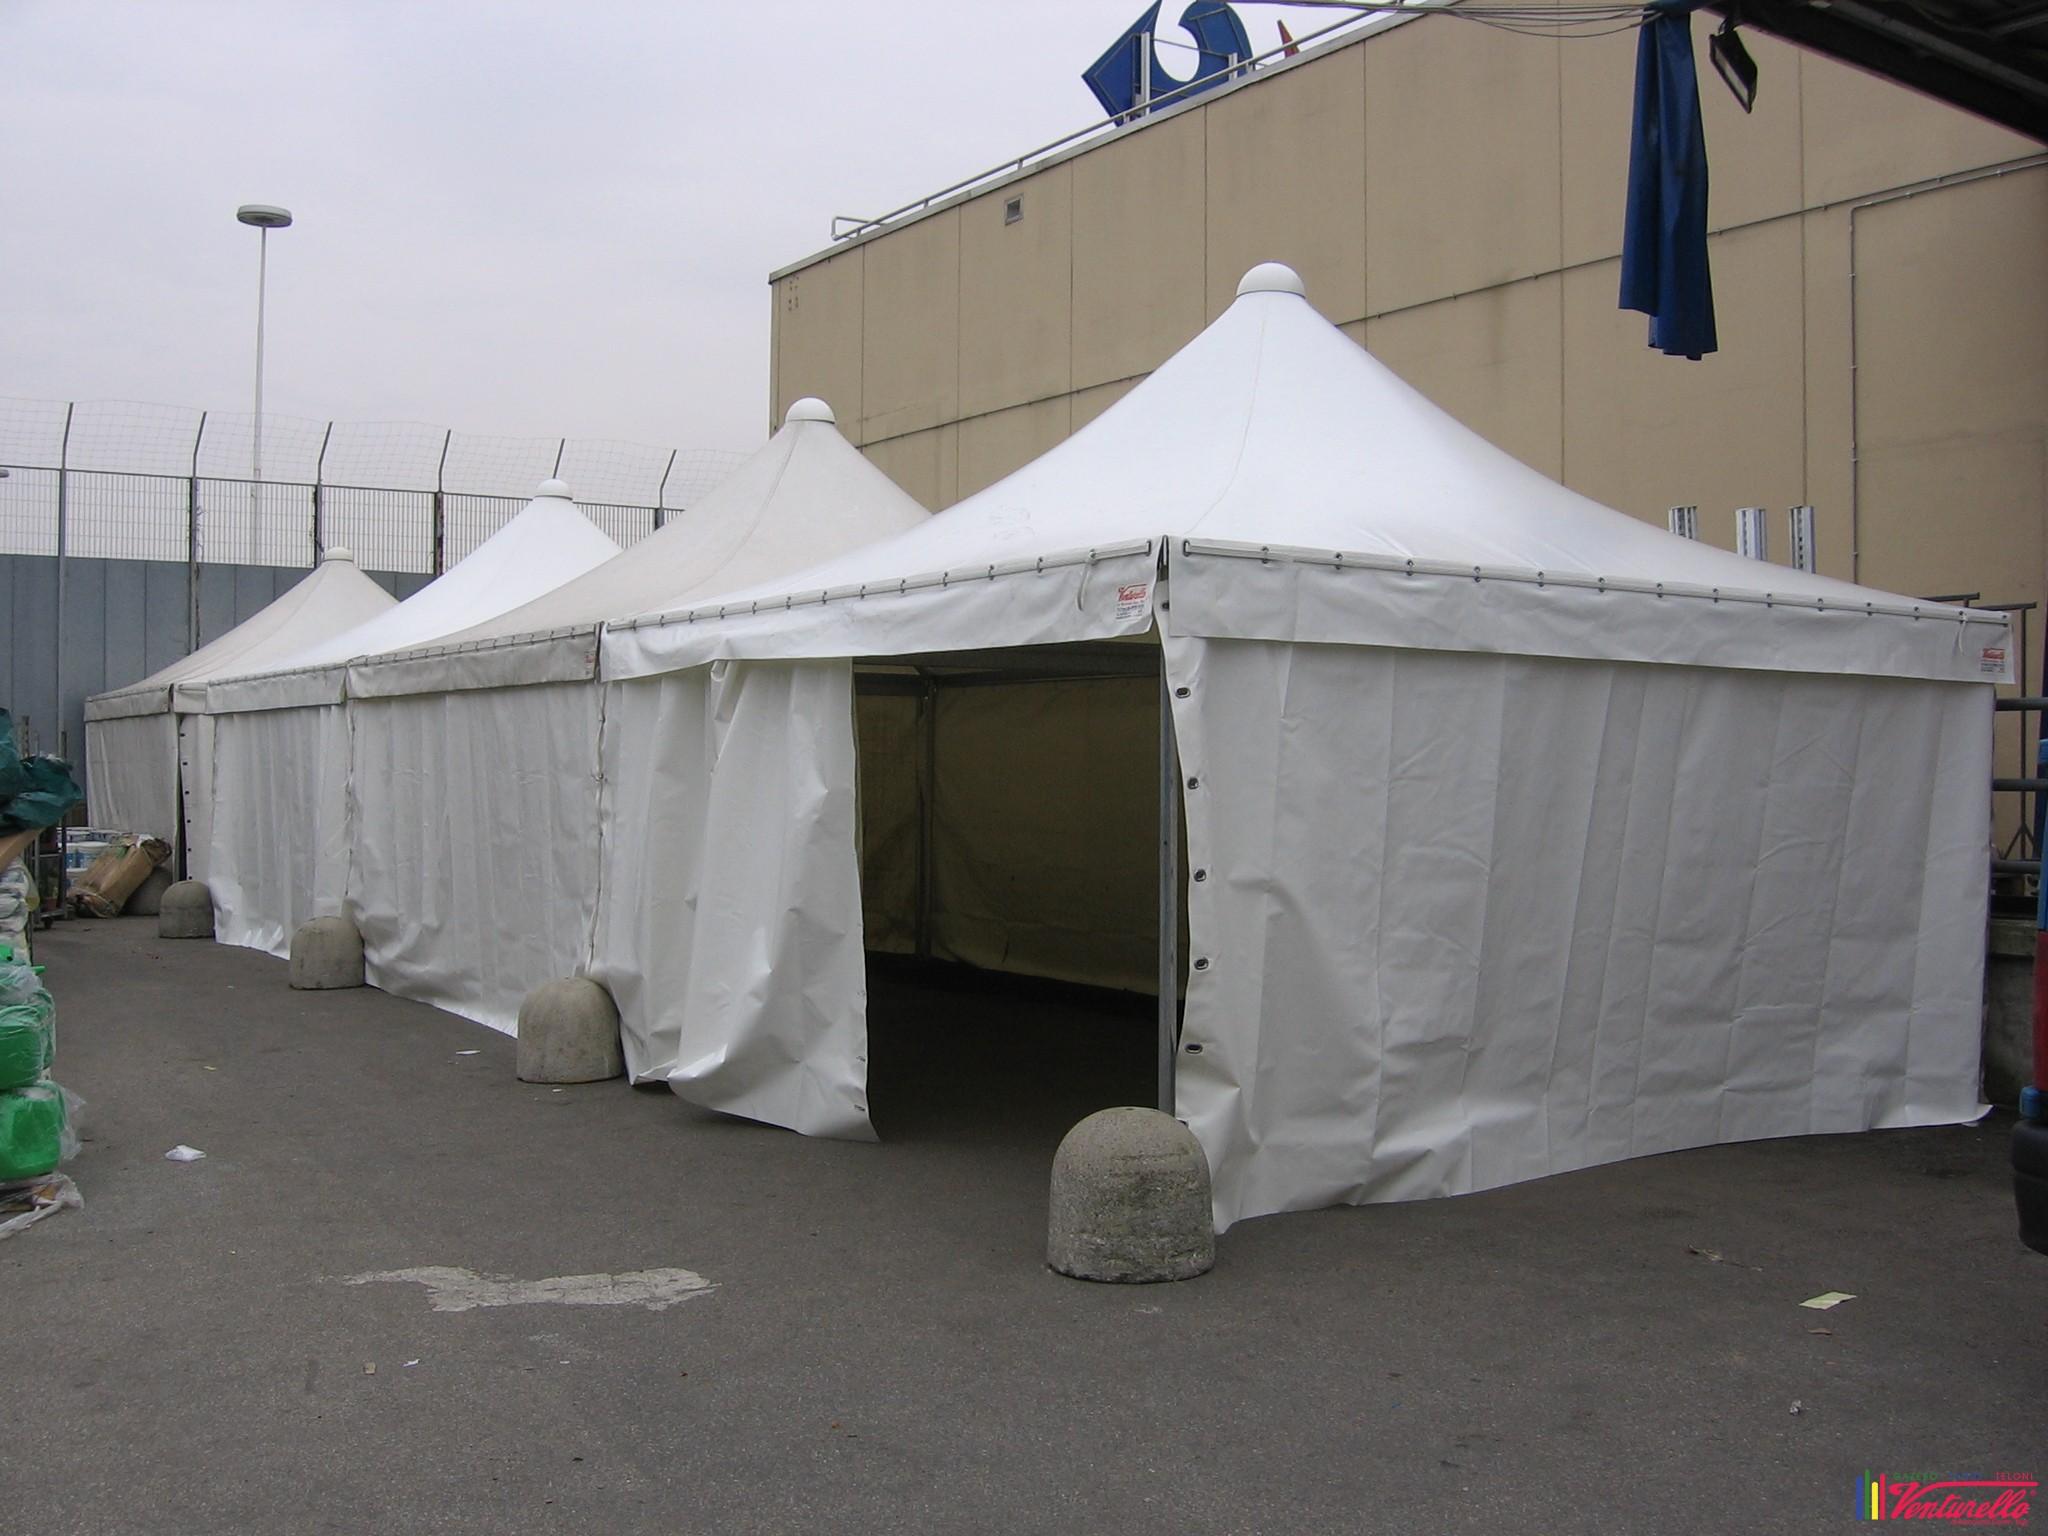 Gazebo per fiere usato u2013 terminali antivento per stufe a pellet